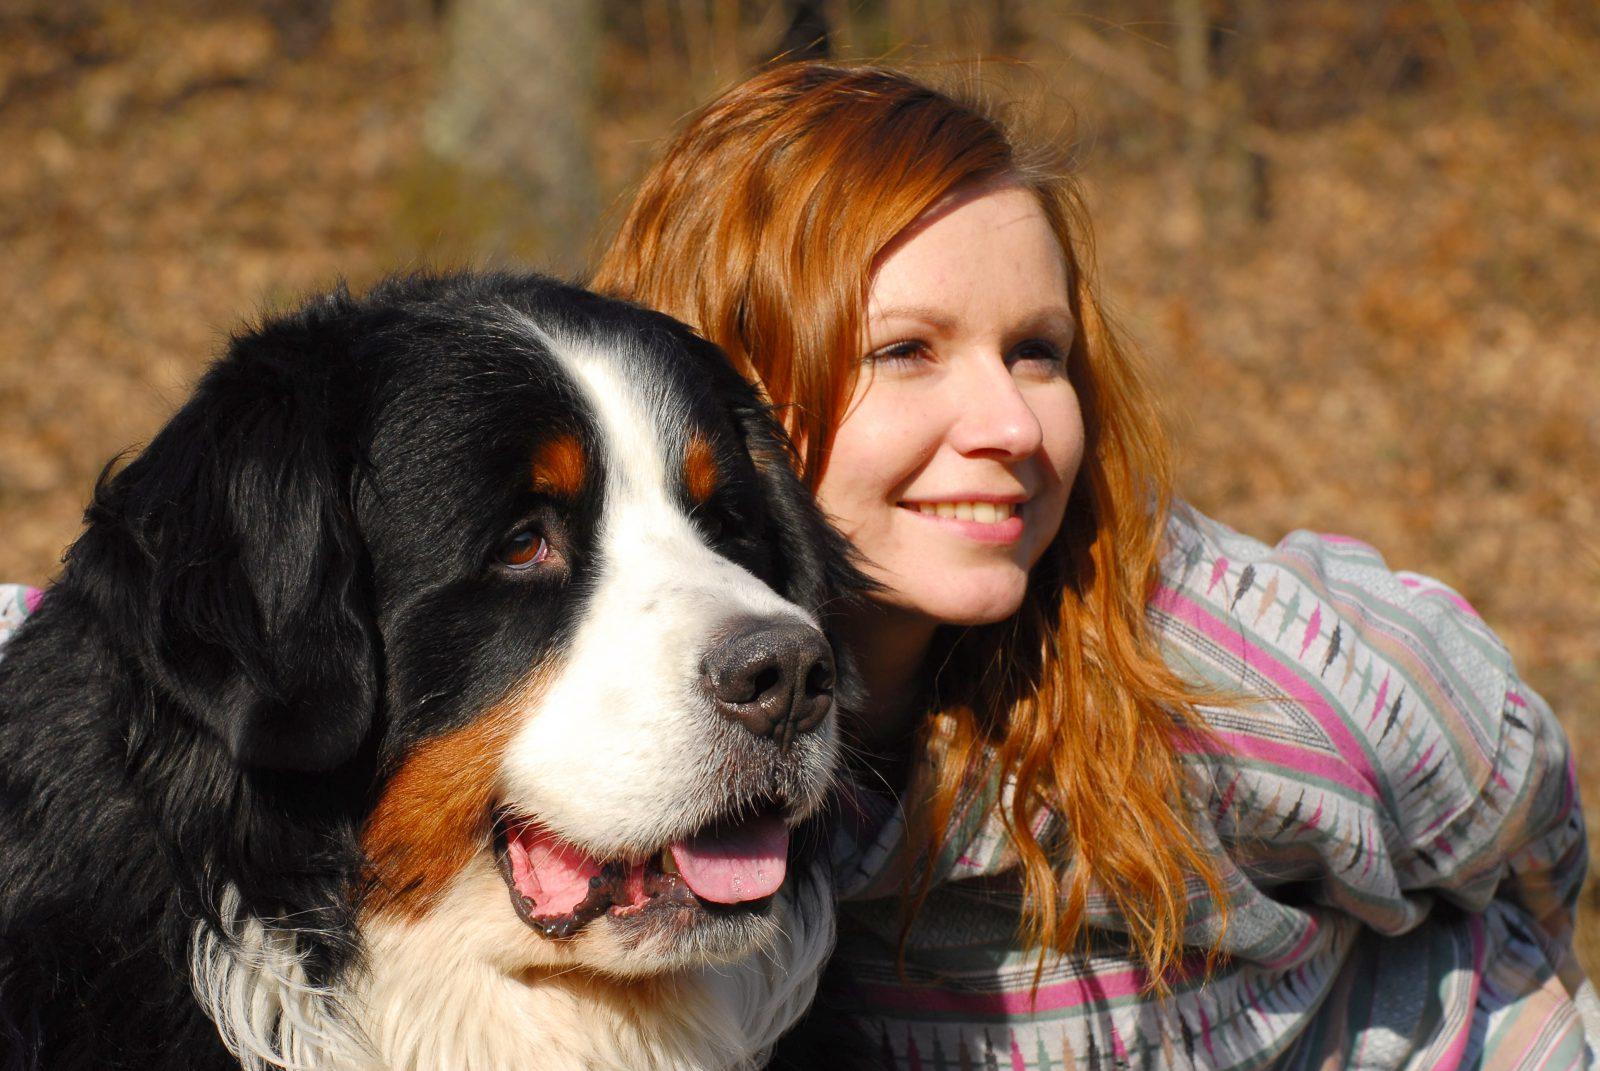 8 raças de cachorros de pêlos longos favoritas